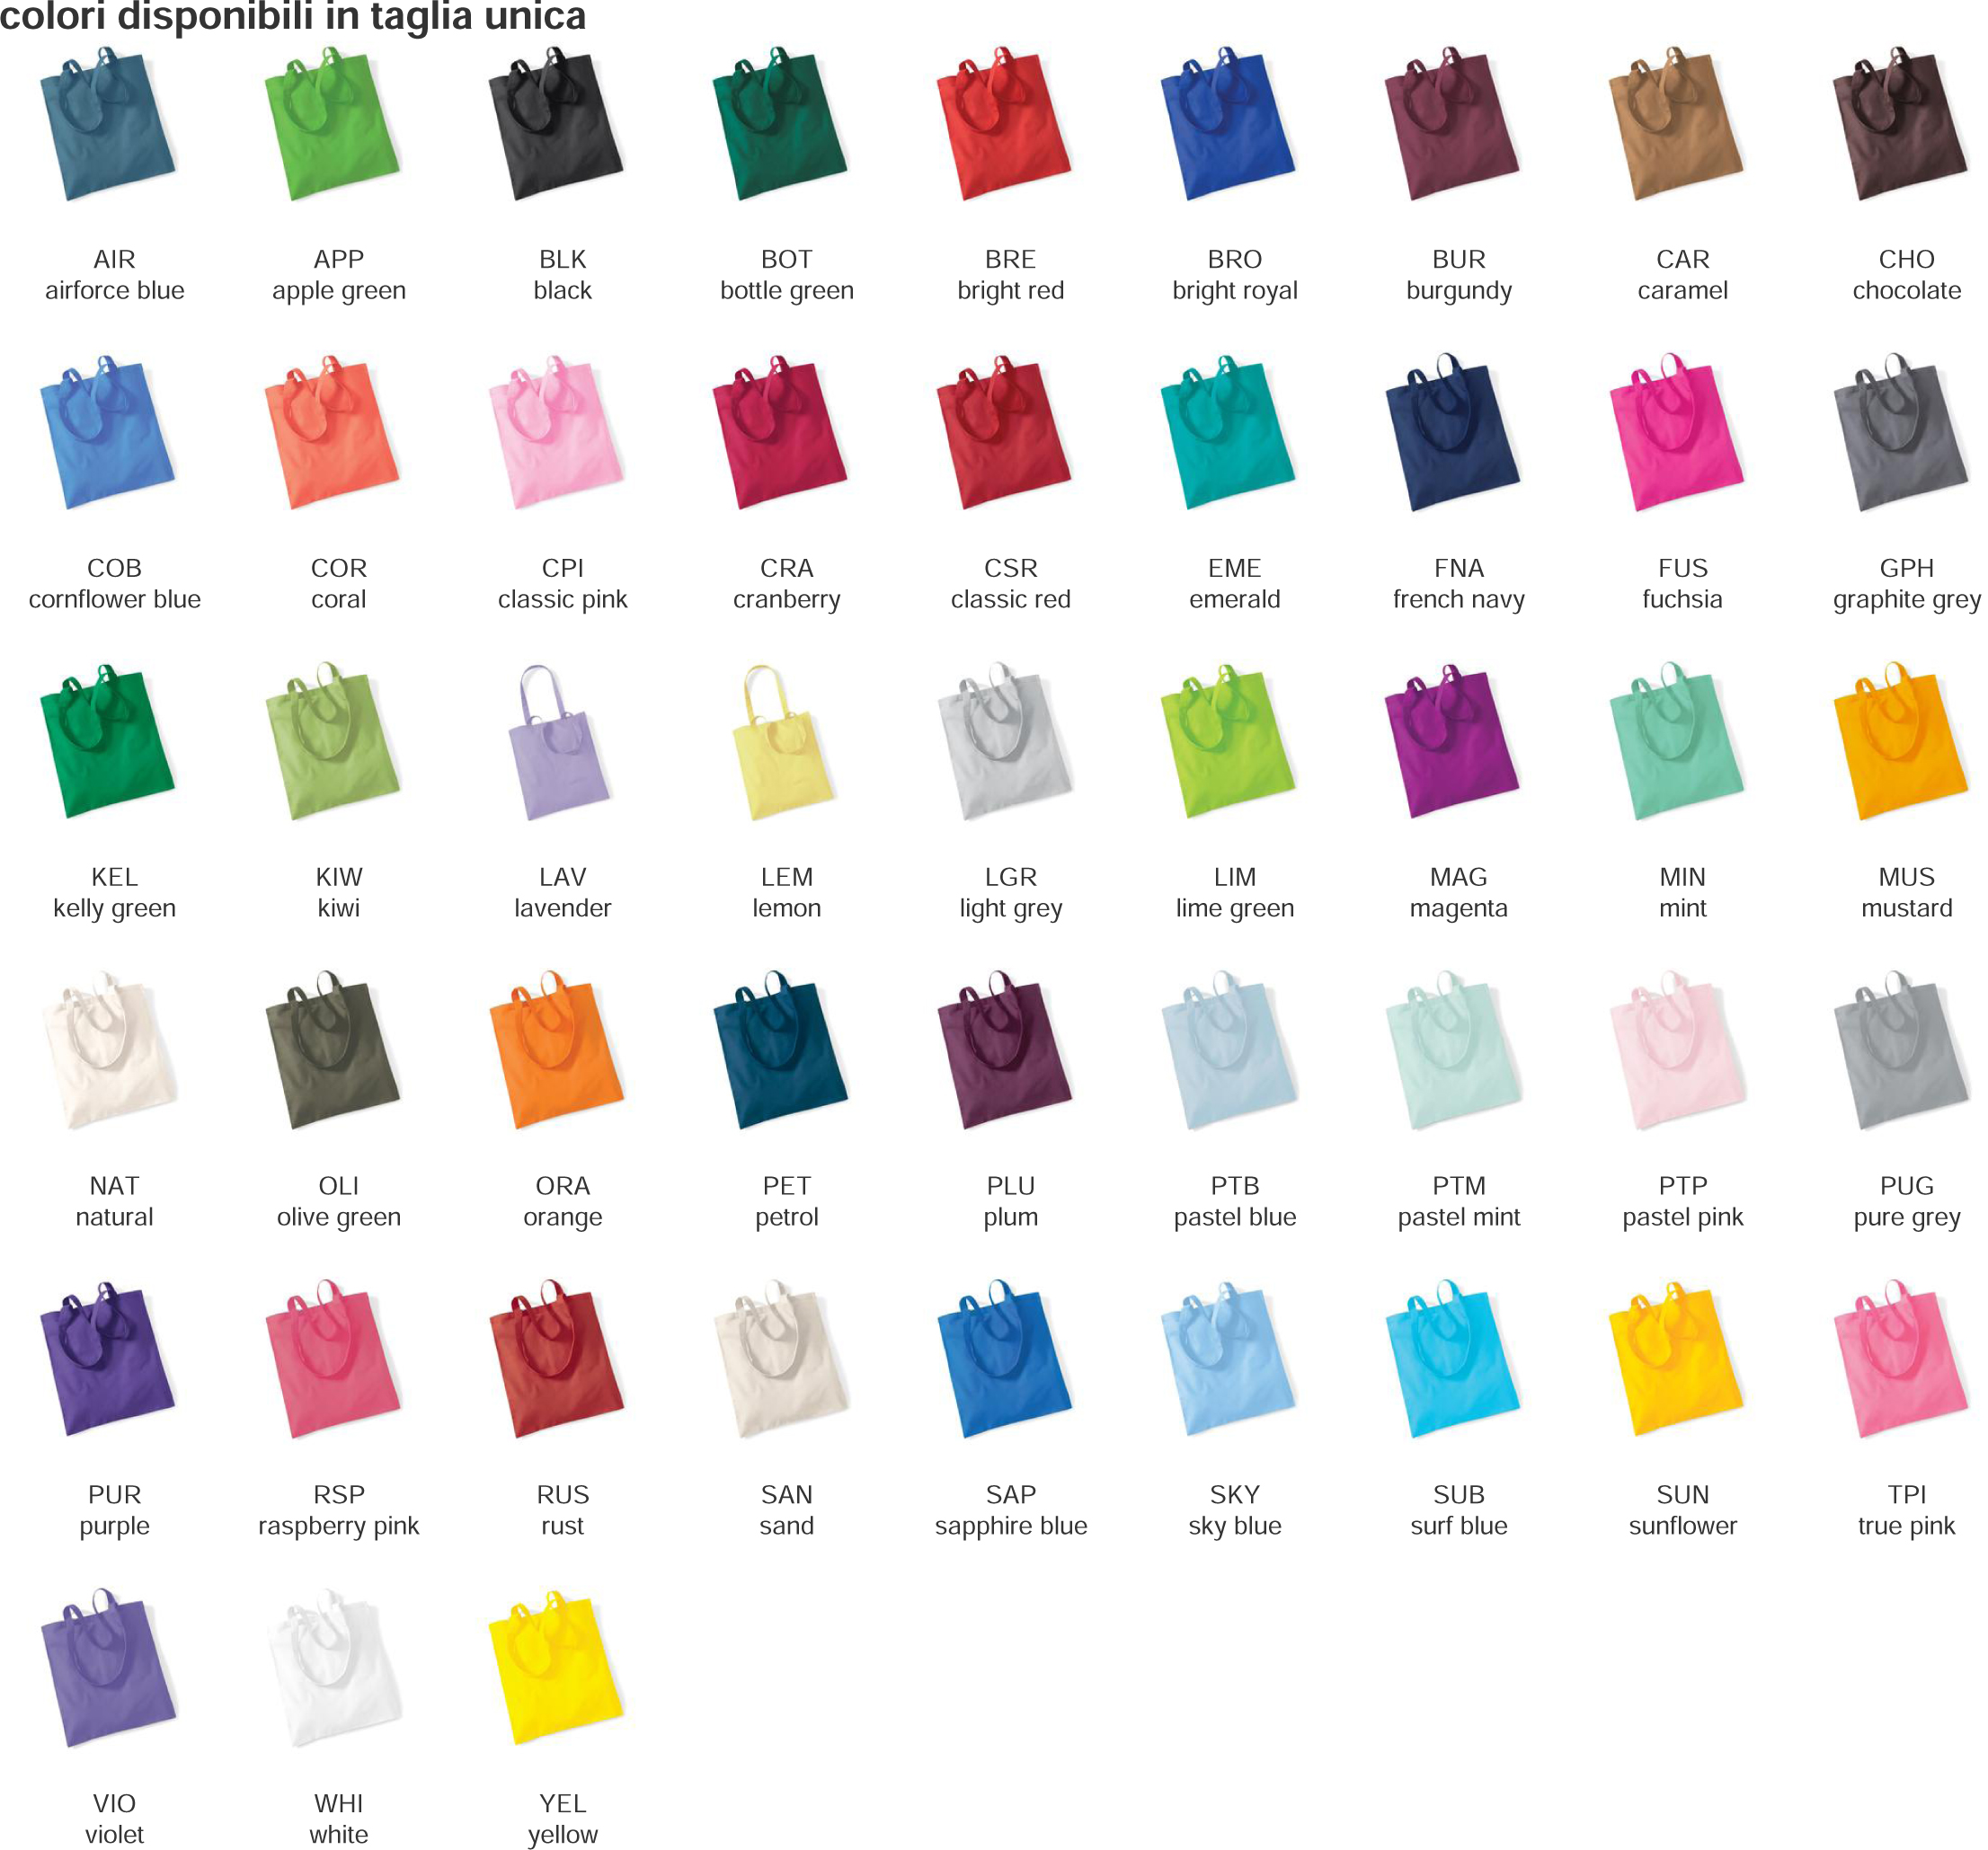 shopper bag colori